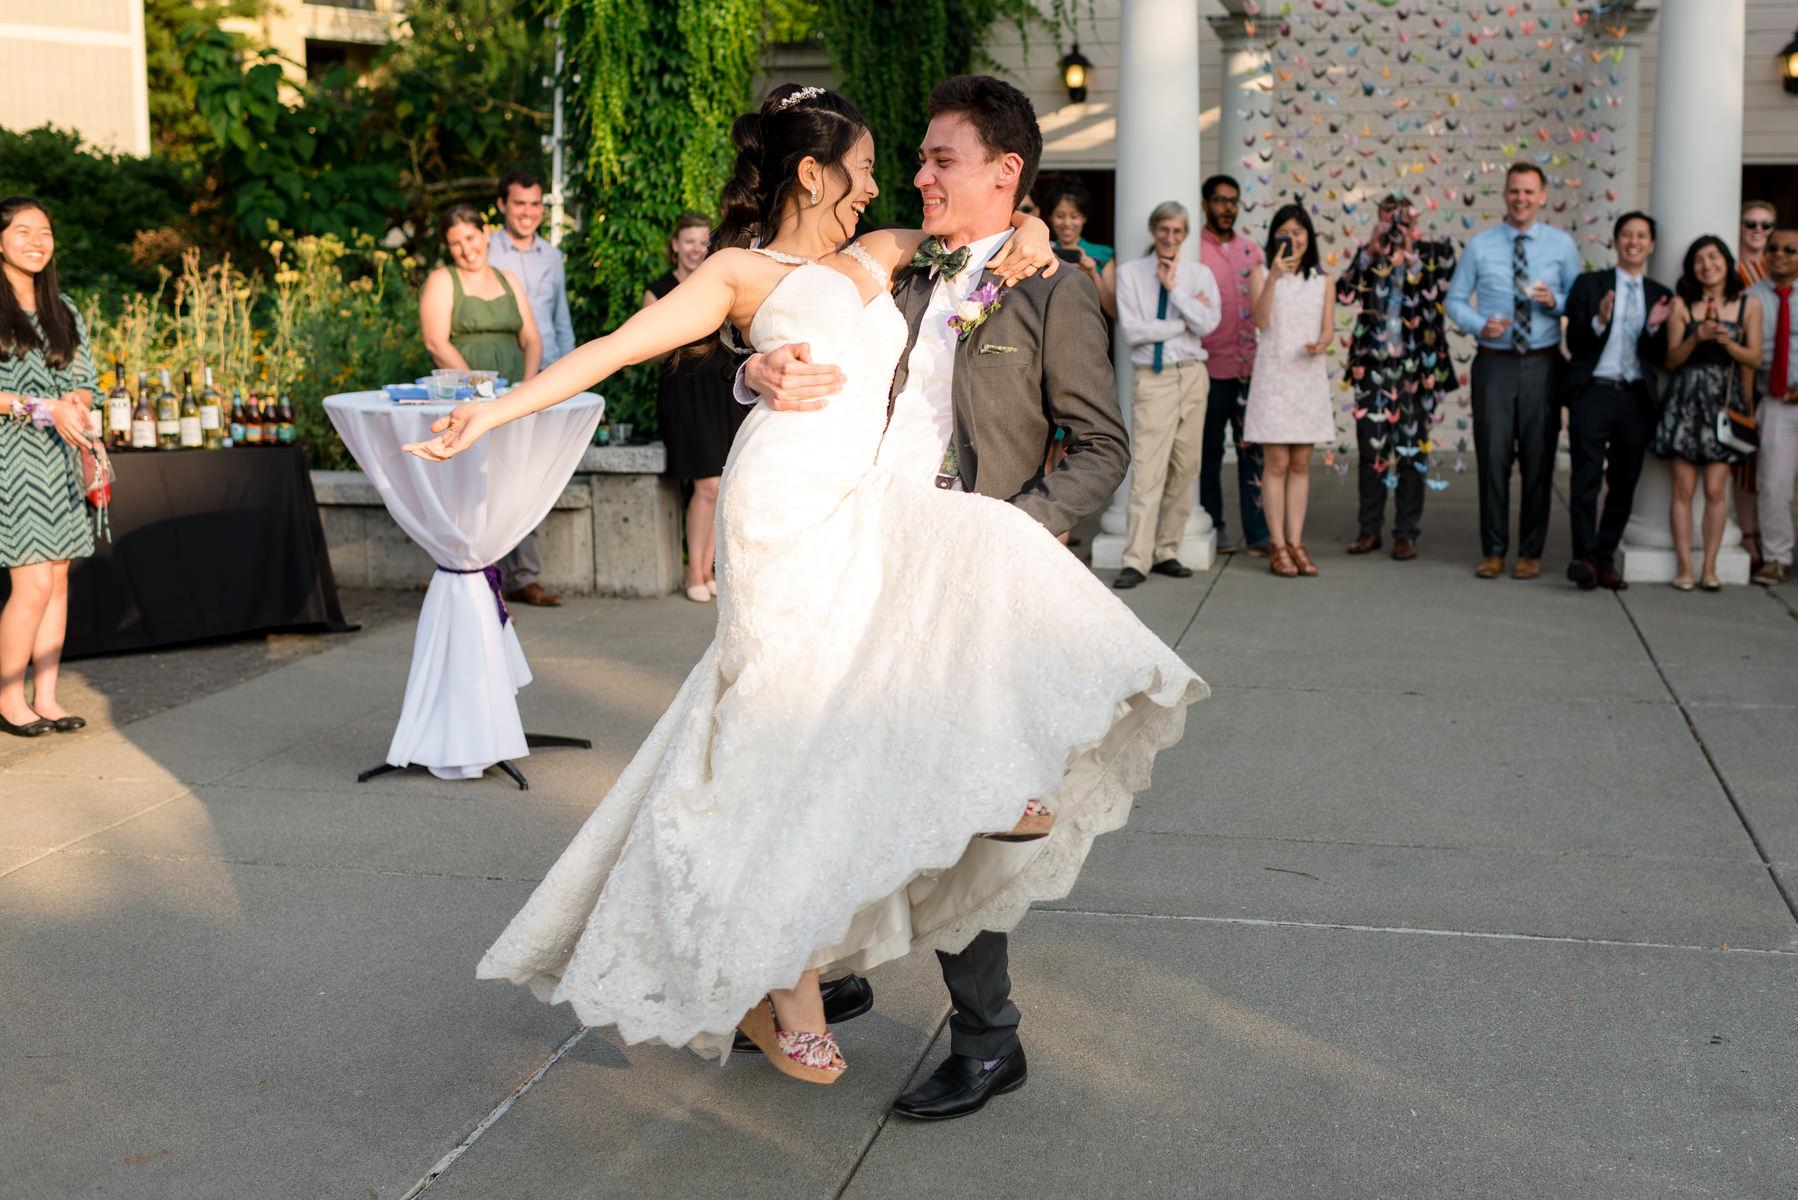 Andrew Tat - Documentary Wedding Photography - Heritage Hall - Kirkland, Washington - Grace & James - 75.JPG